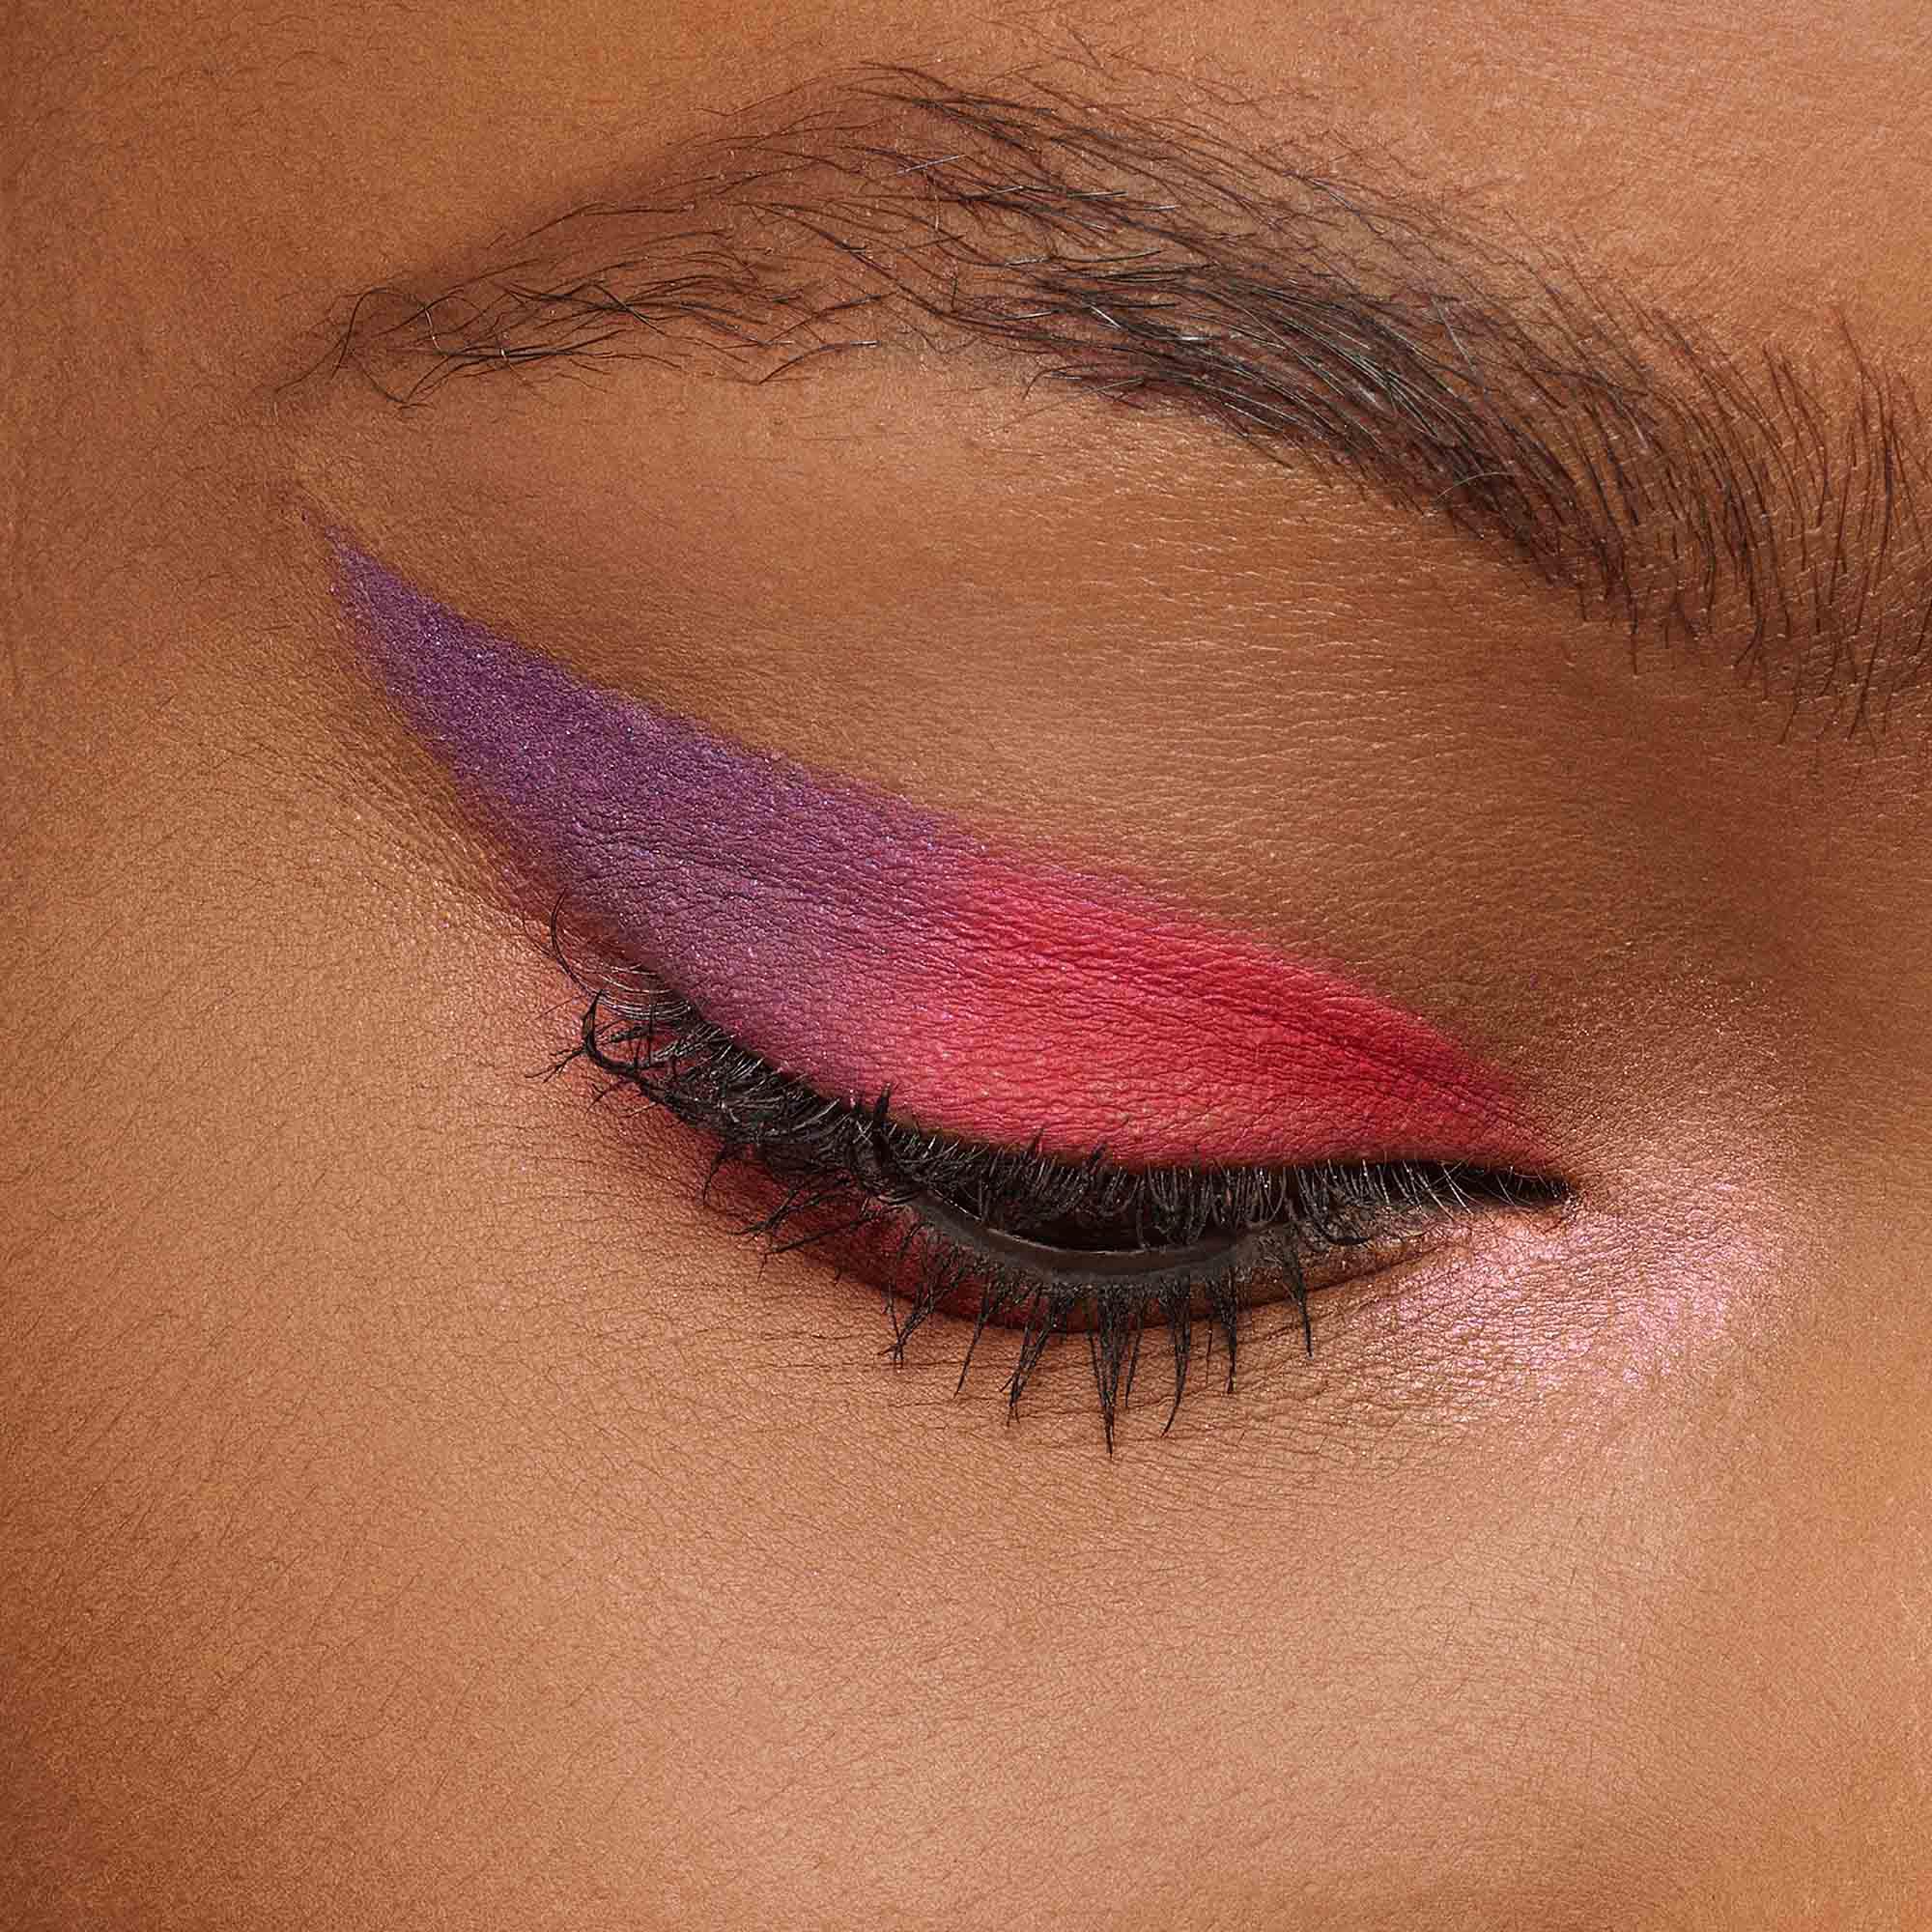 Achieve Epic Looks with KVD Vegan Beauty Shake Vegan Eyeshadow Primer